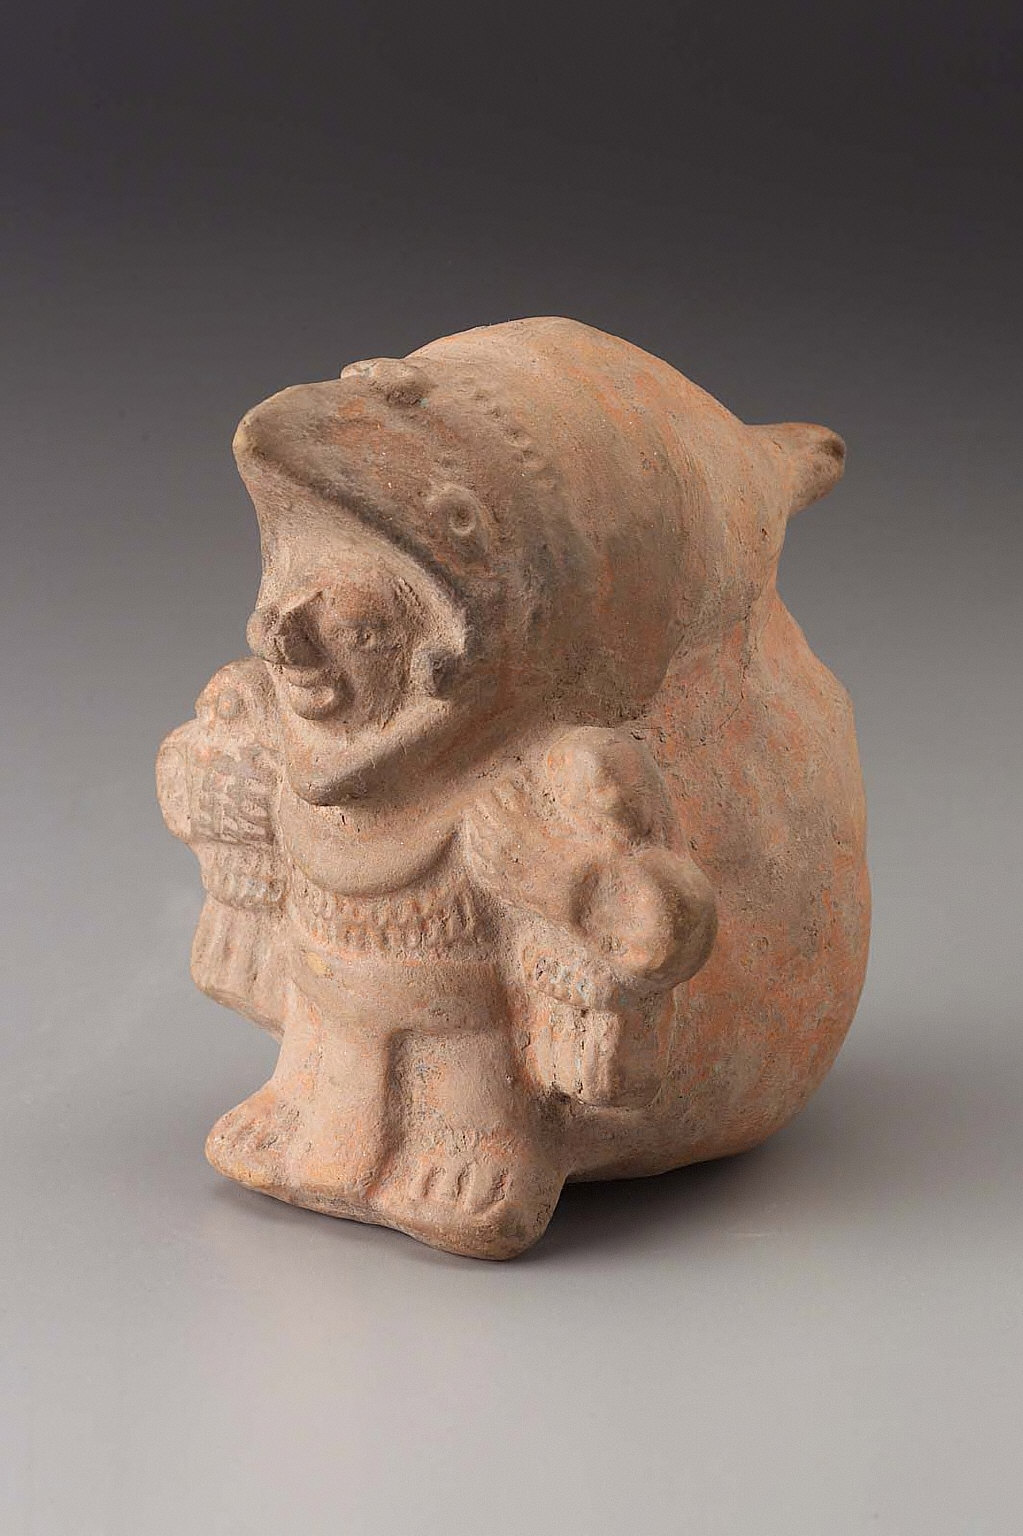 Costumed male effigy figure